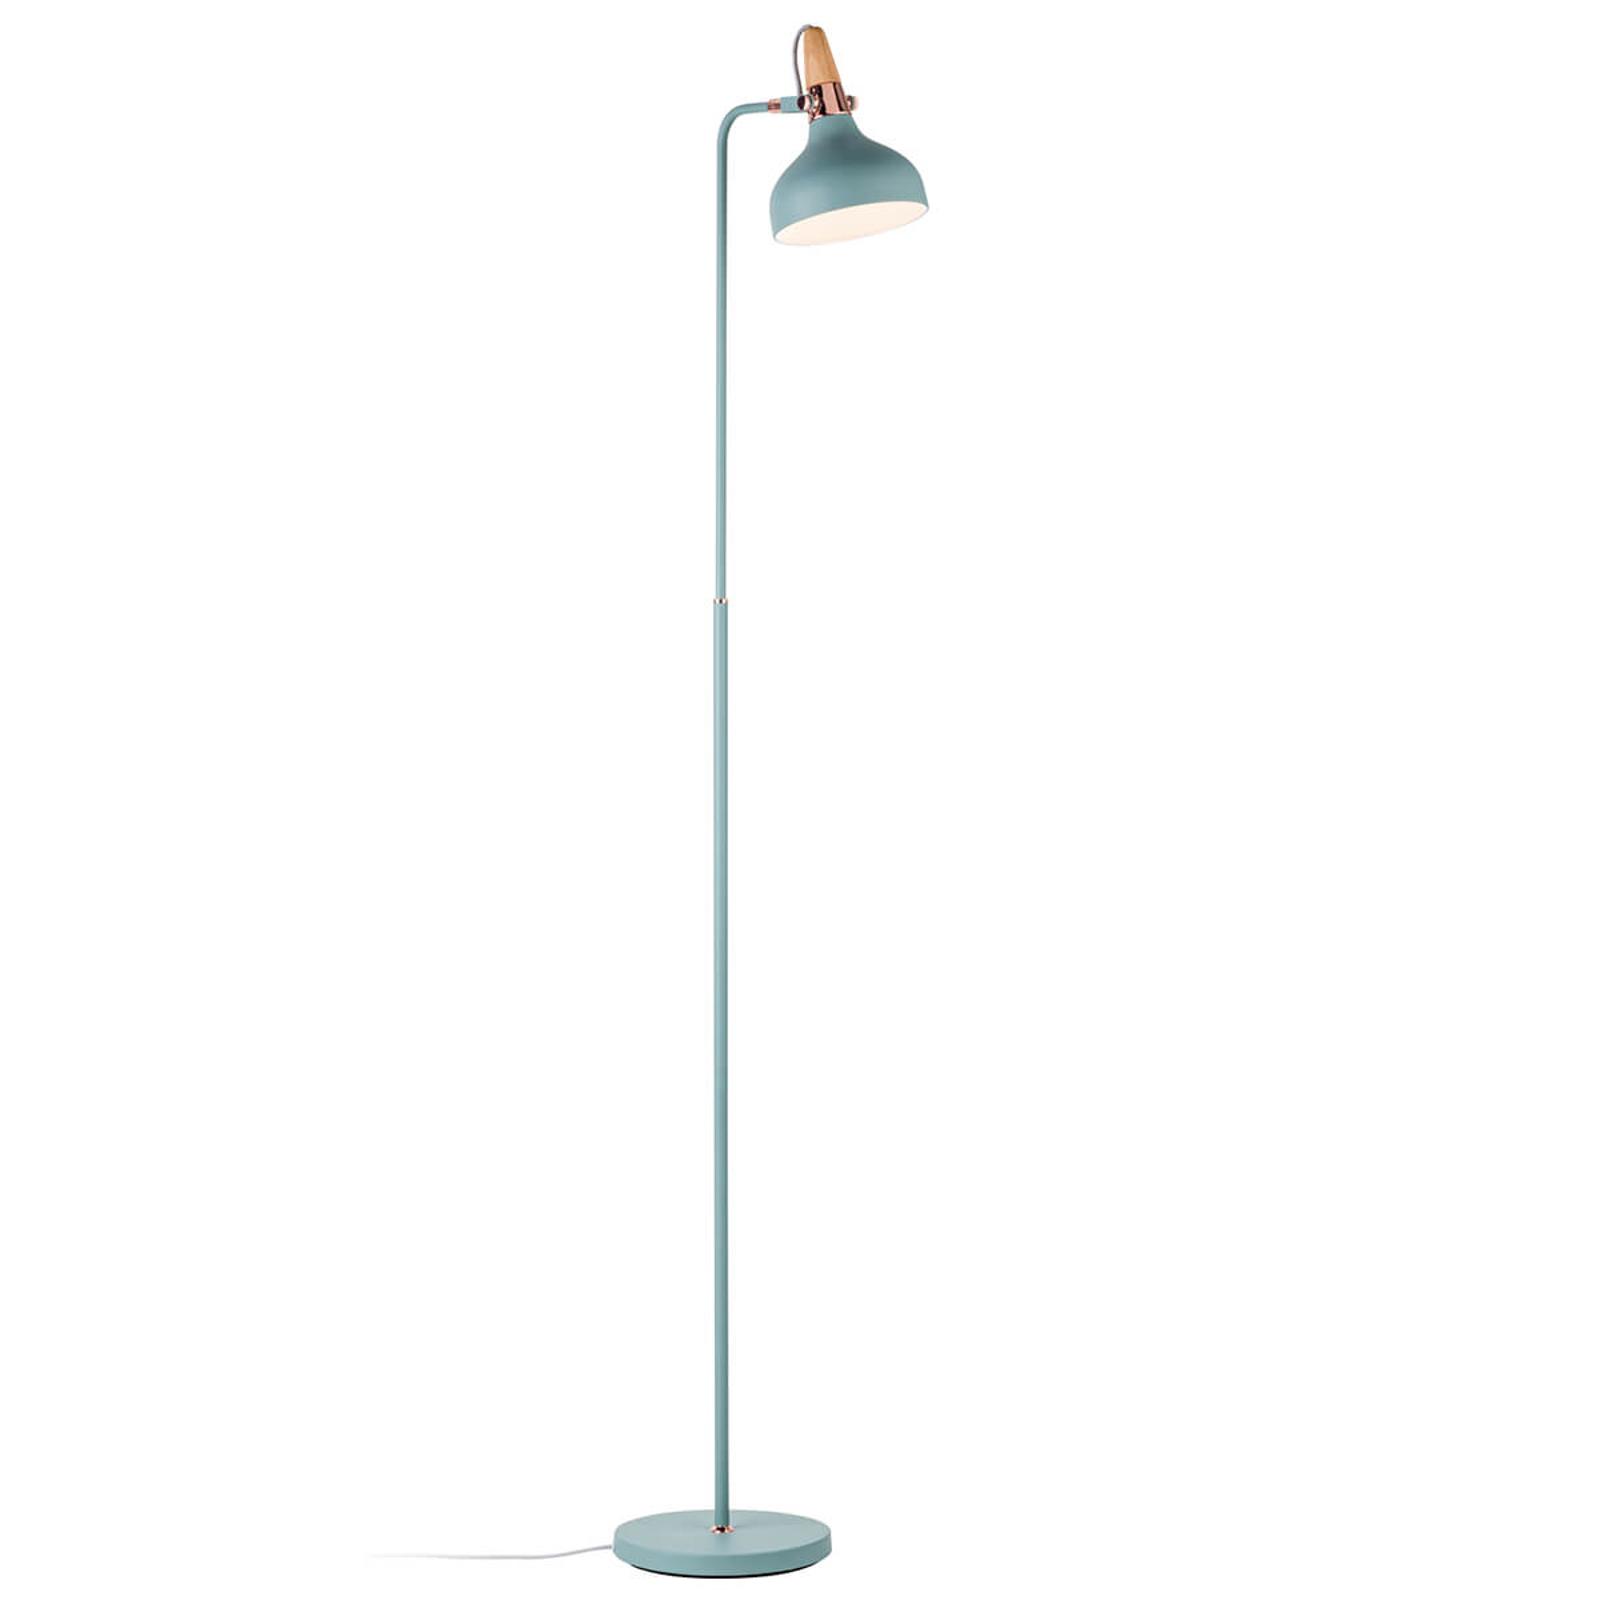 Paulmann Juna vloerlamp met chique details